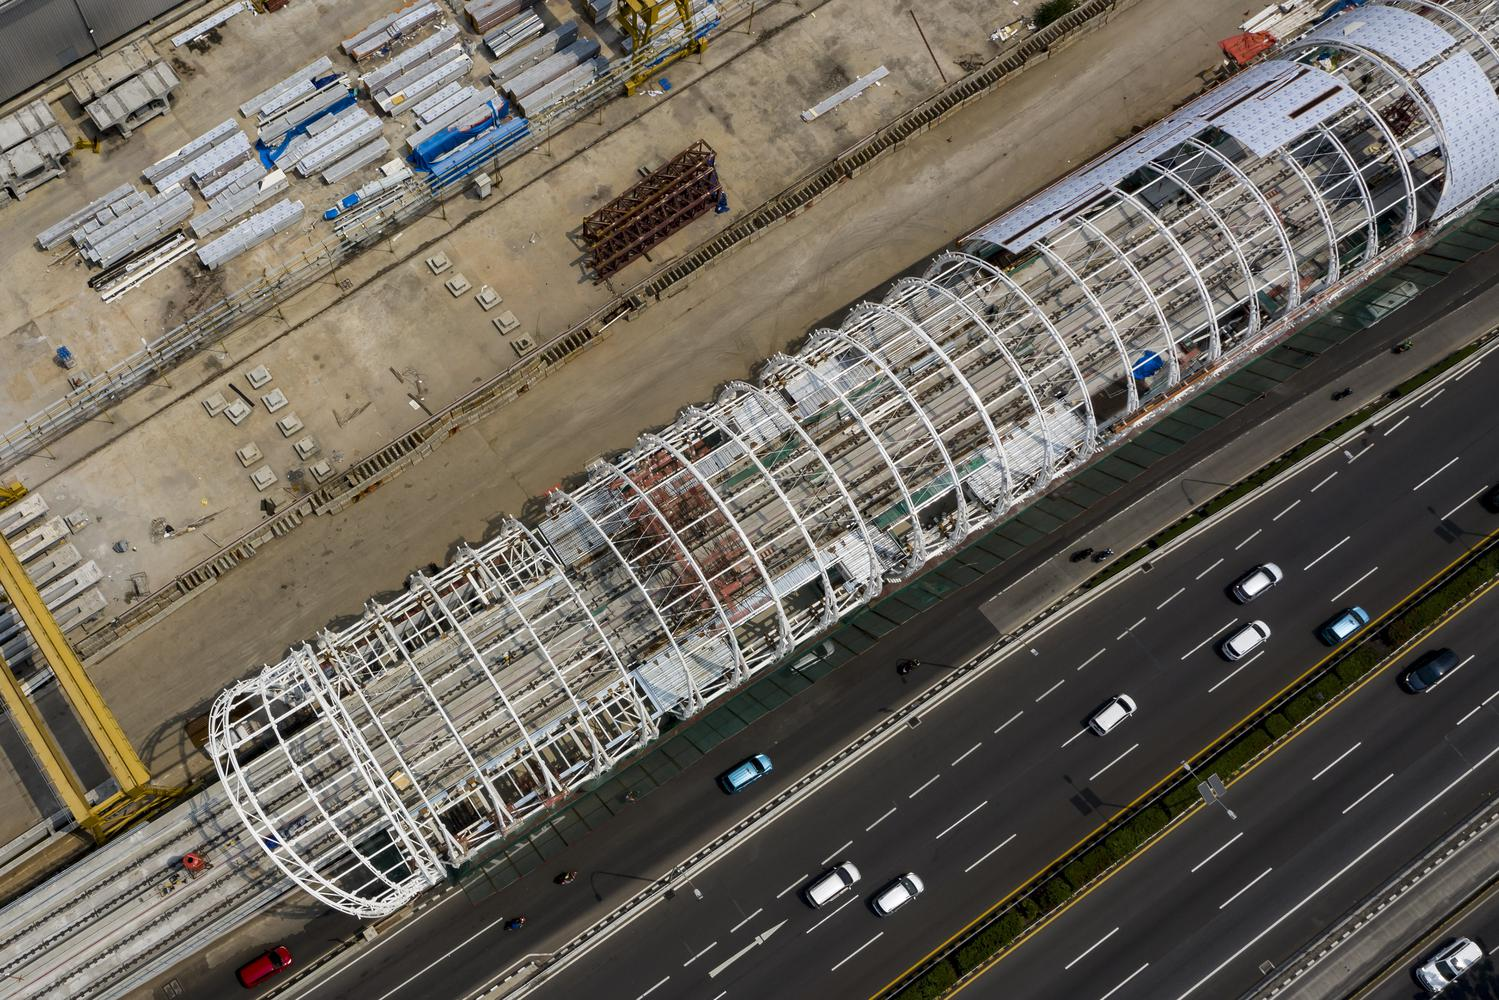 Foto udara pembangunan jalur LRT Jabodebek di kawasan Pancoran, Jakarta, Minggu (2/8/2020). Perkembangan pembangunan jalur kereta api ringan atau LRT Jabodebek Lintas Pelayanan II, Cawang-Kuningan-Dukuh atas kini telah mencapai 65,9 persen, sedangkan pelayanan Cawang-Cibubur sudah sampai 87,34 persen. Seluruh lintasan itu ditarget rampung semua pembangunannya pada 2021.